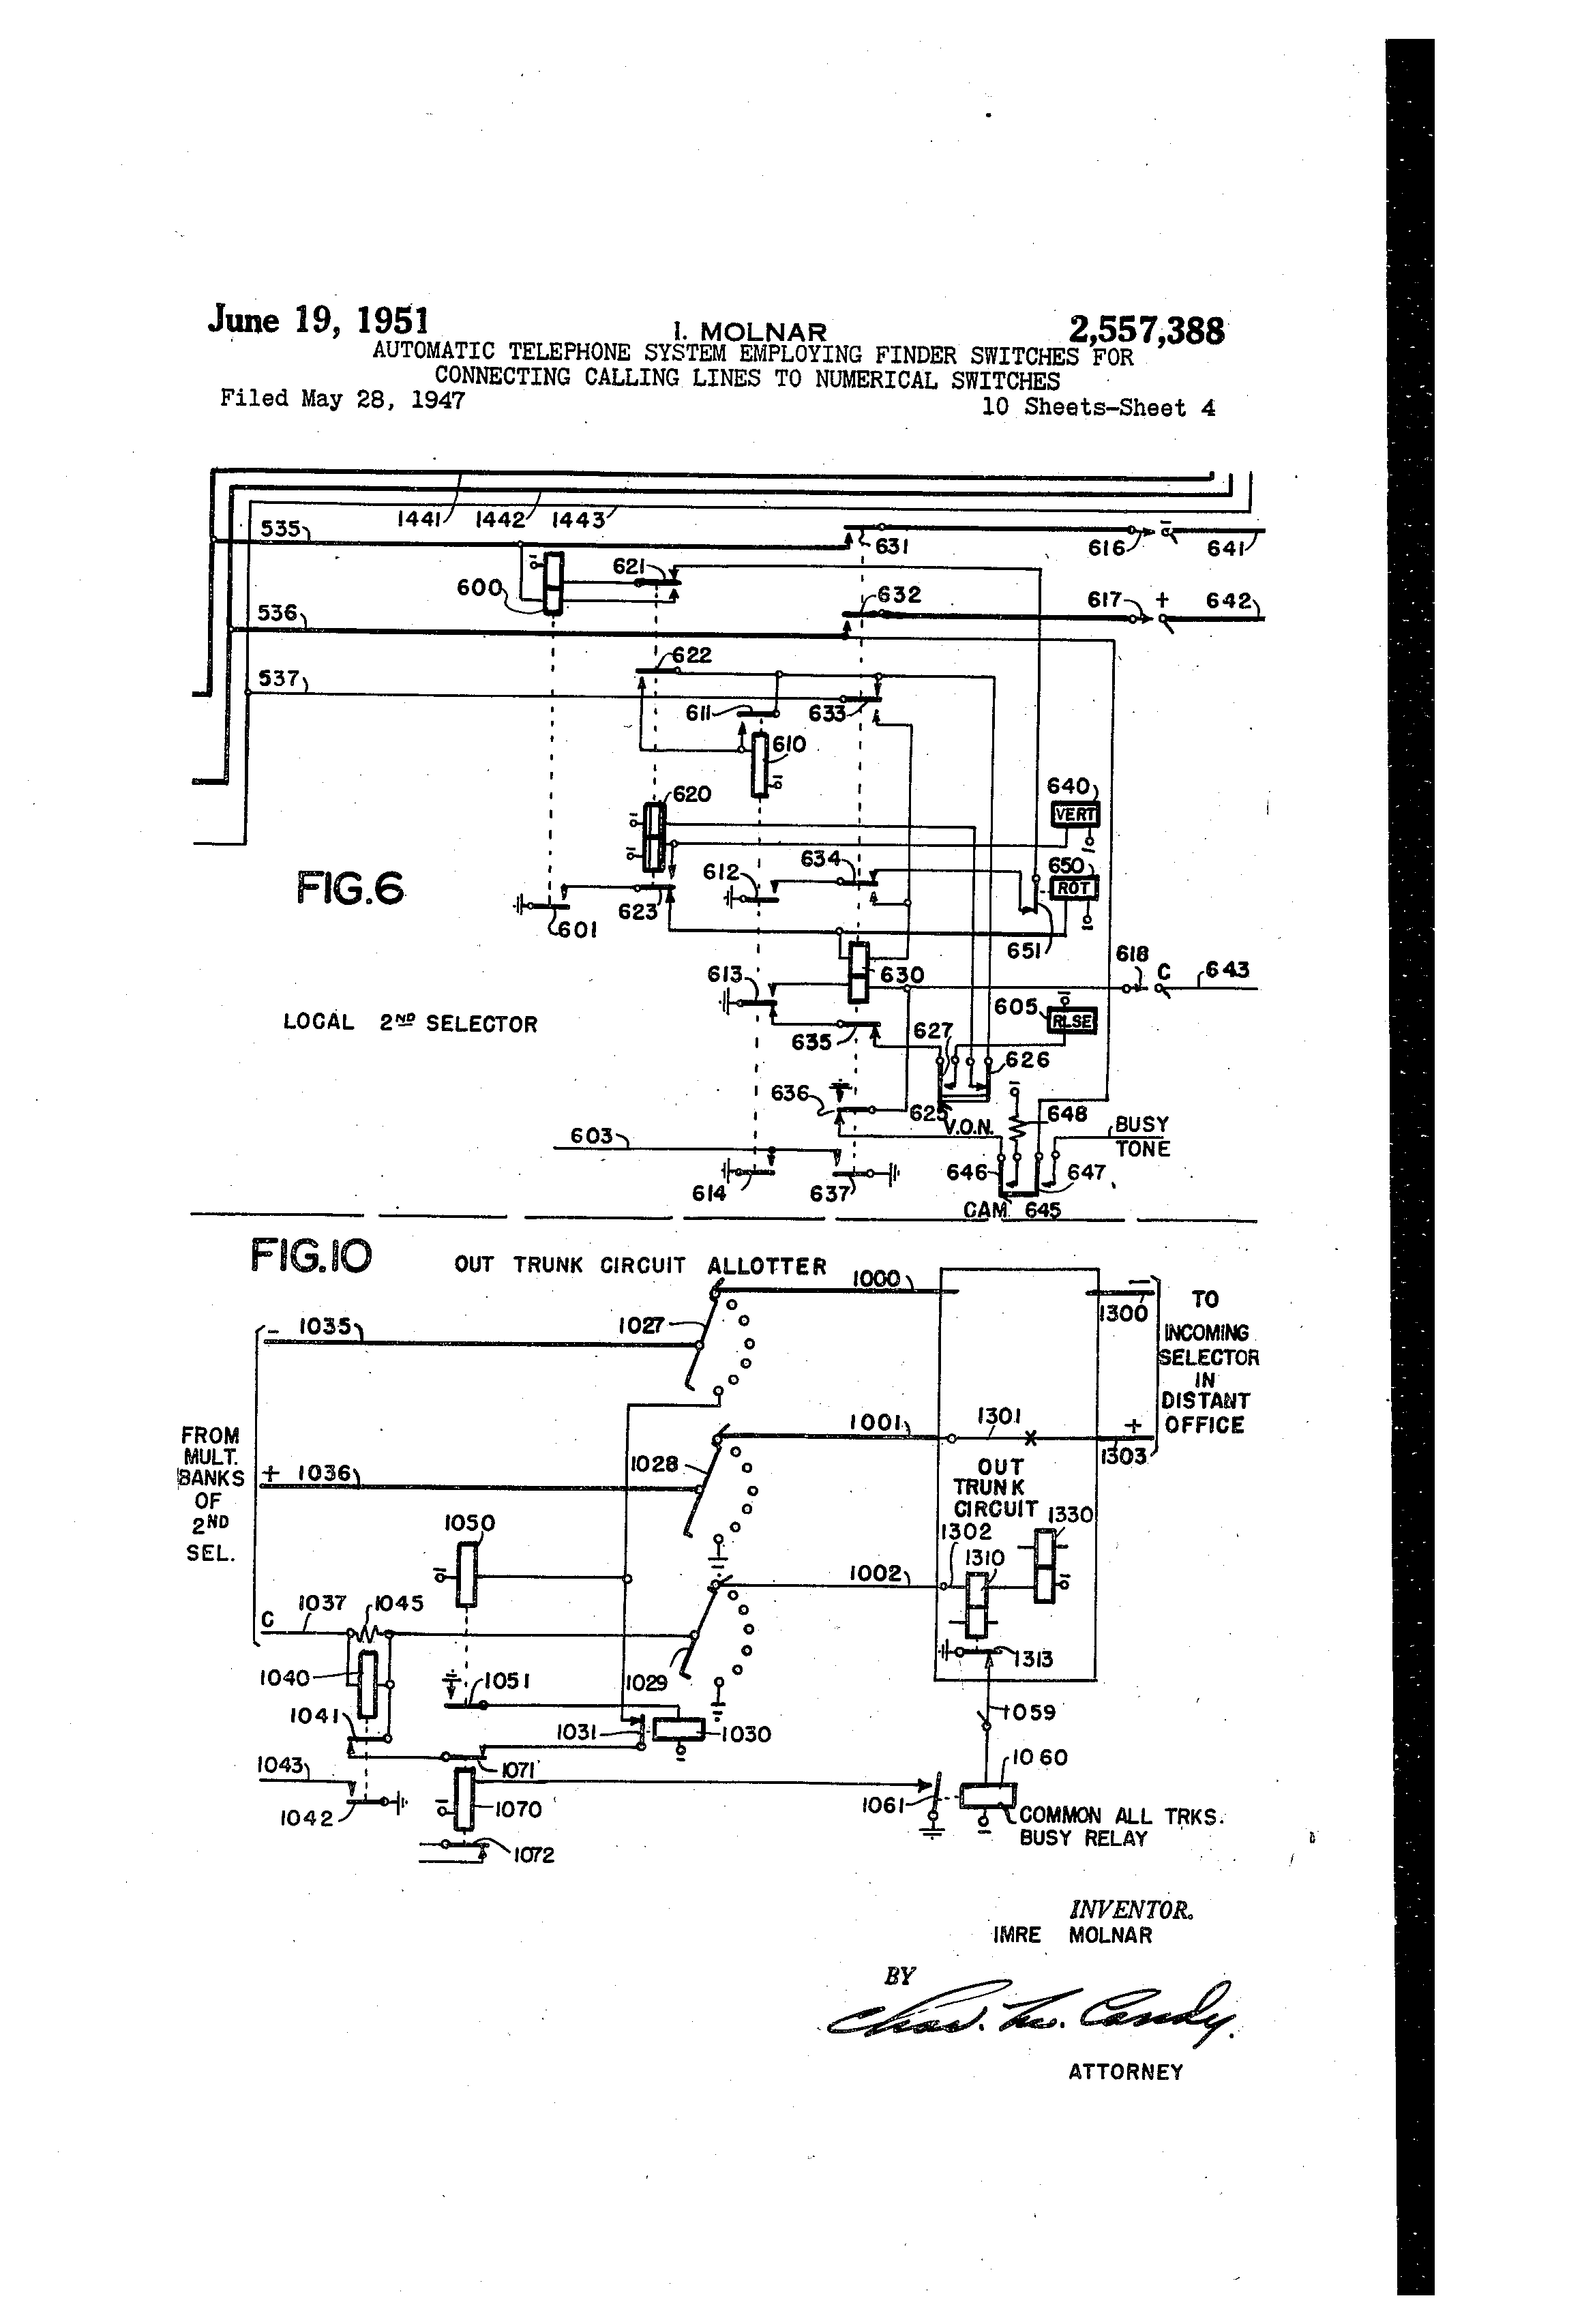 Edwards Transformer 598 Wiring Diagram - 1999 Ford 4 0 Engine Diagram -  loader.2014ok.jeanjaures37.frWiring Diagram Resource